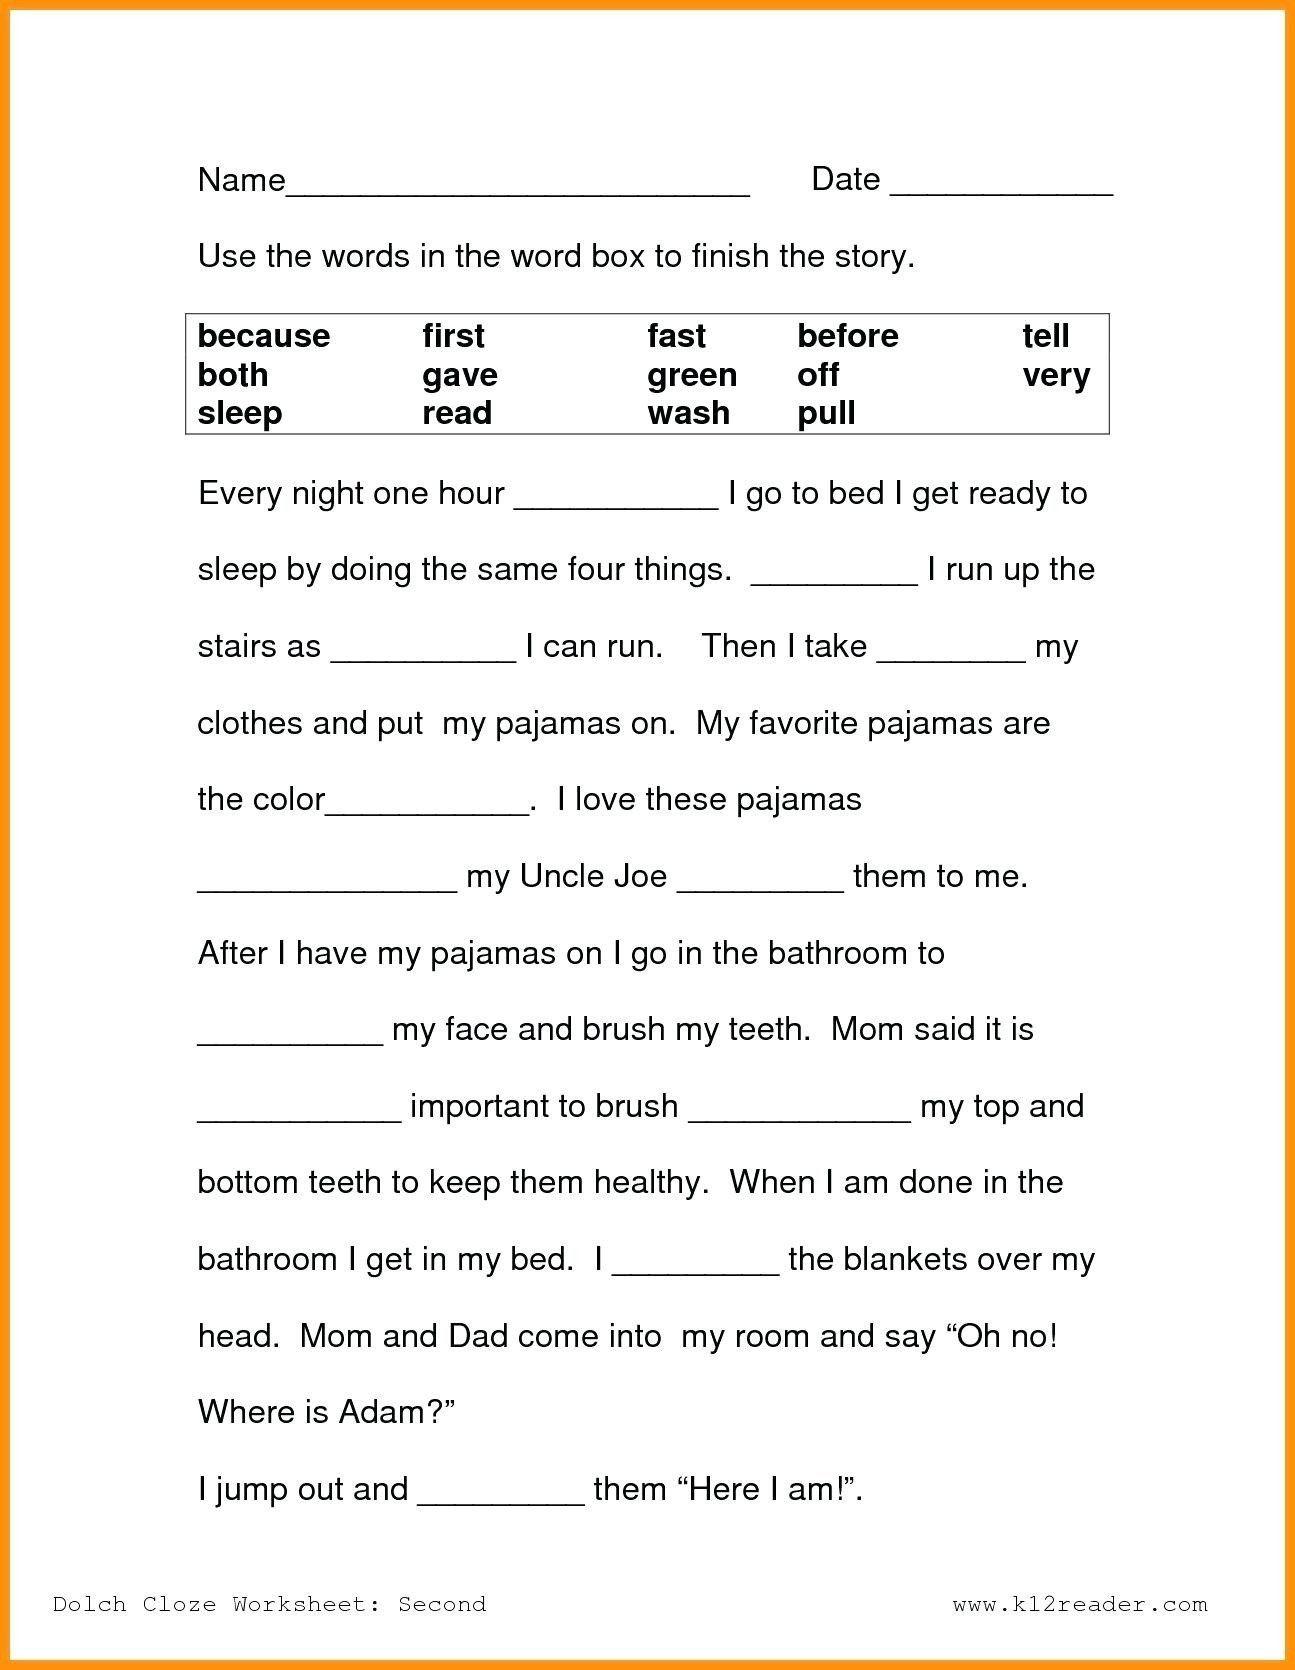 Economics For Kids Worksheets Reading Worskheets Worksheet Ideas Extraordi In 2020 2nd Grade Reading Worksheets Reading Comprehension Worksheets First Grade Worksheets